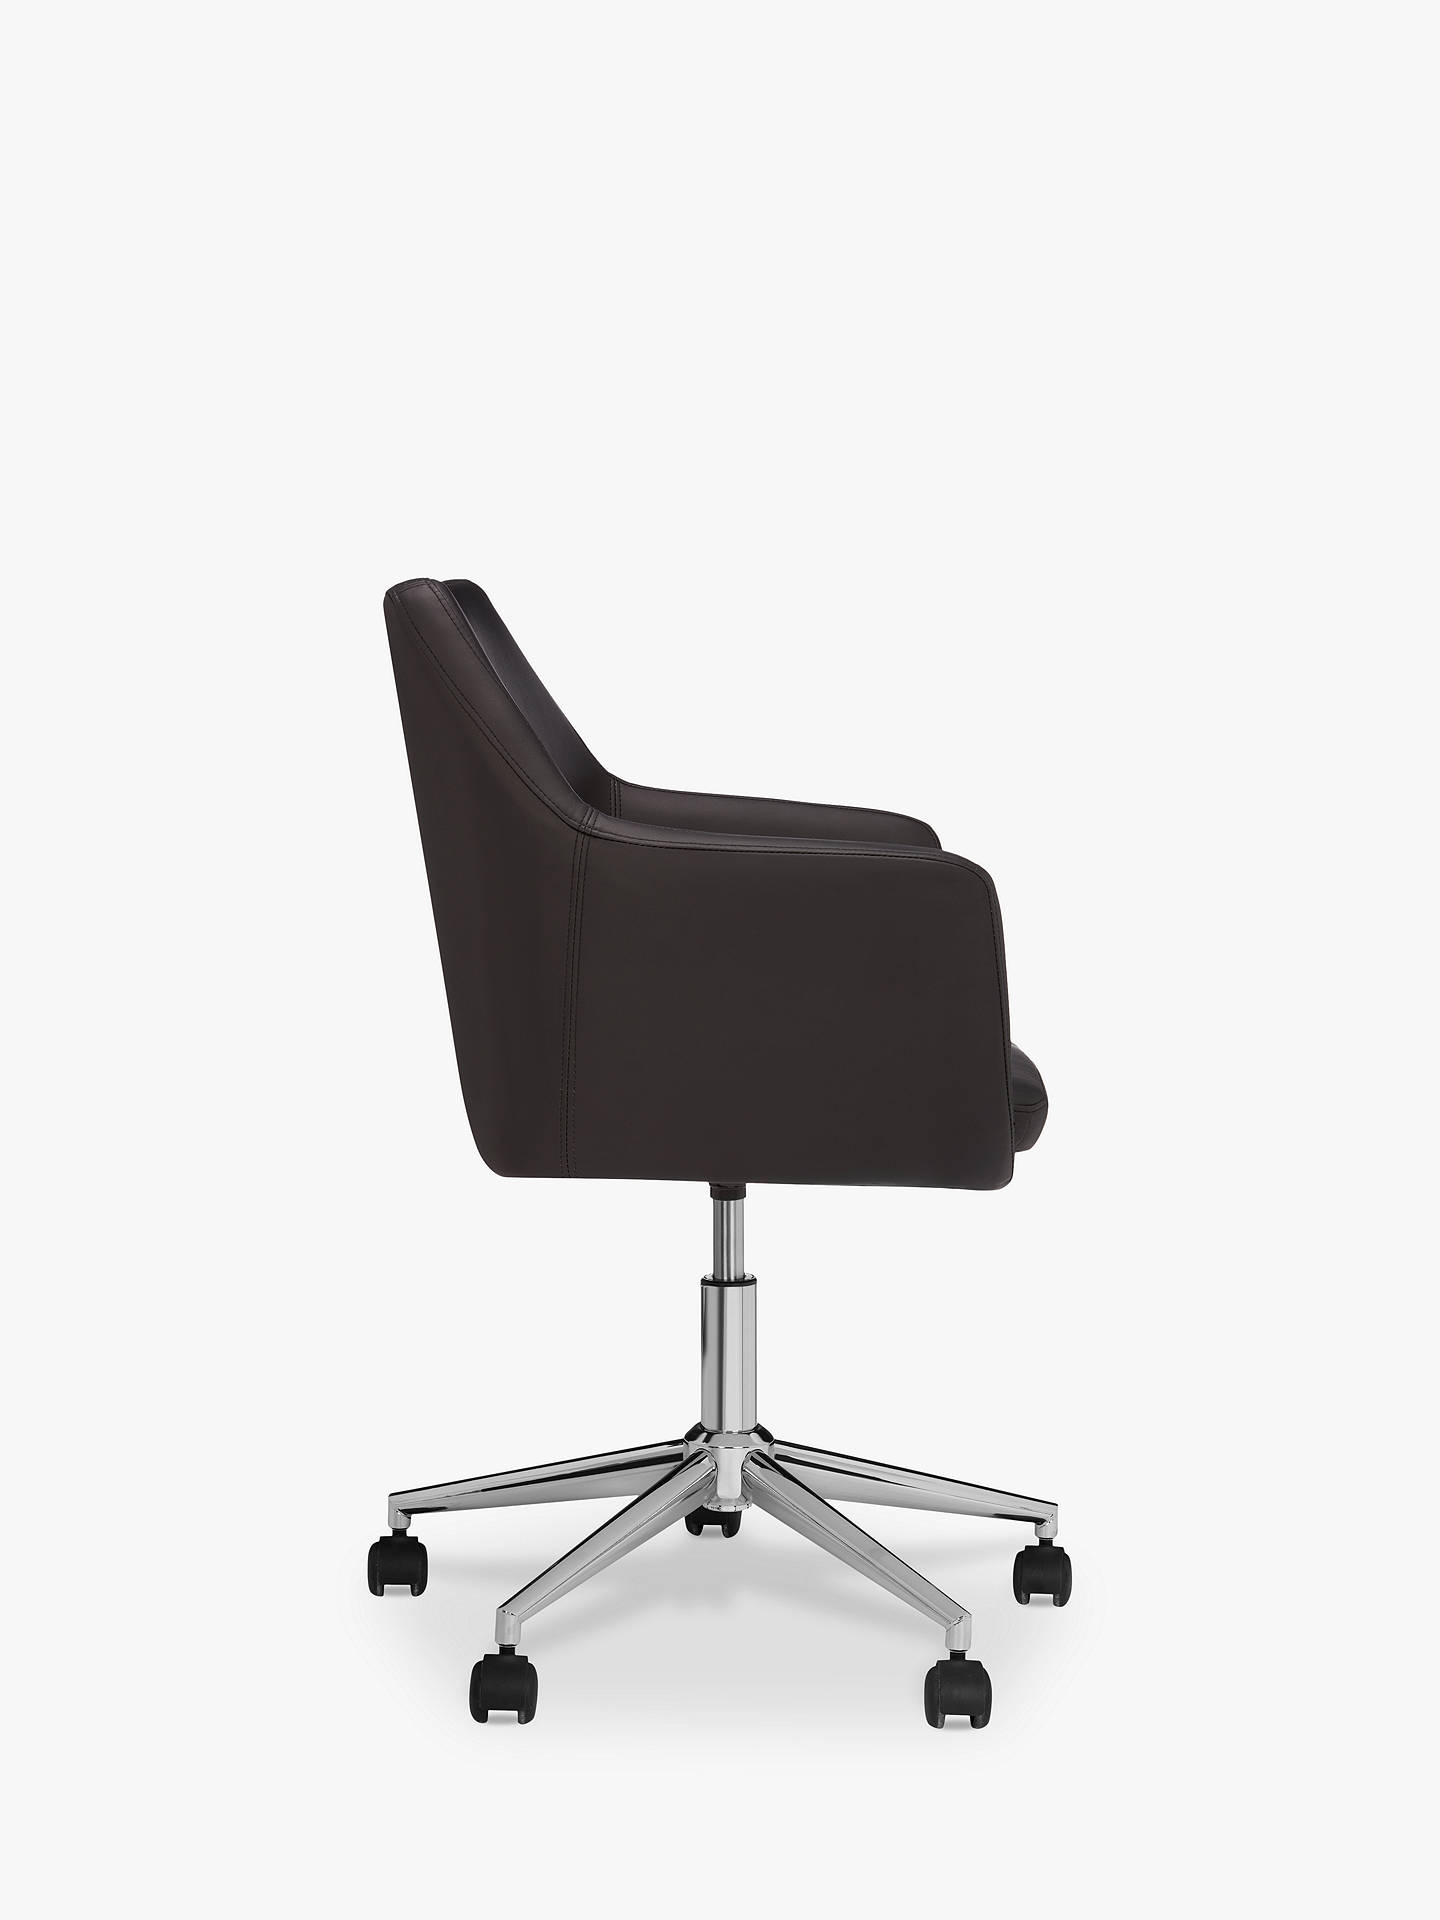 John Lewis & Partners Reid Faux Leather Office Chair, Black